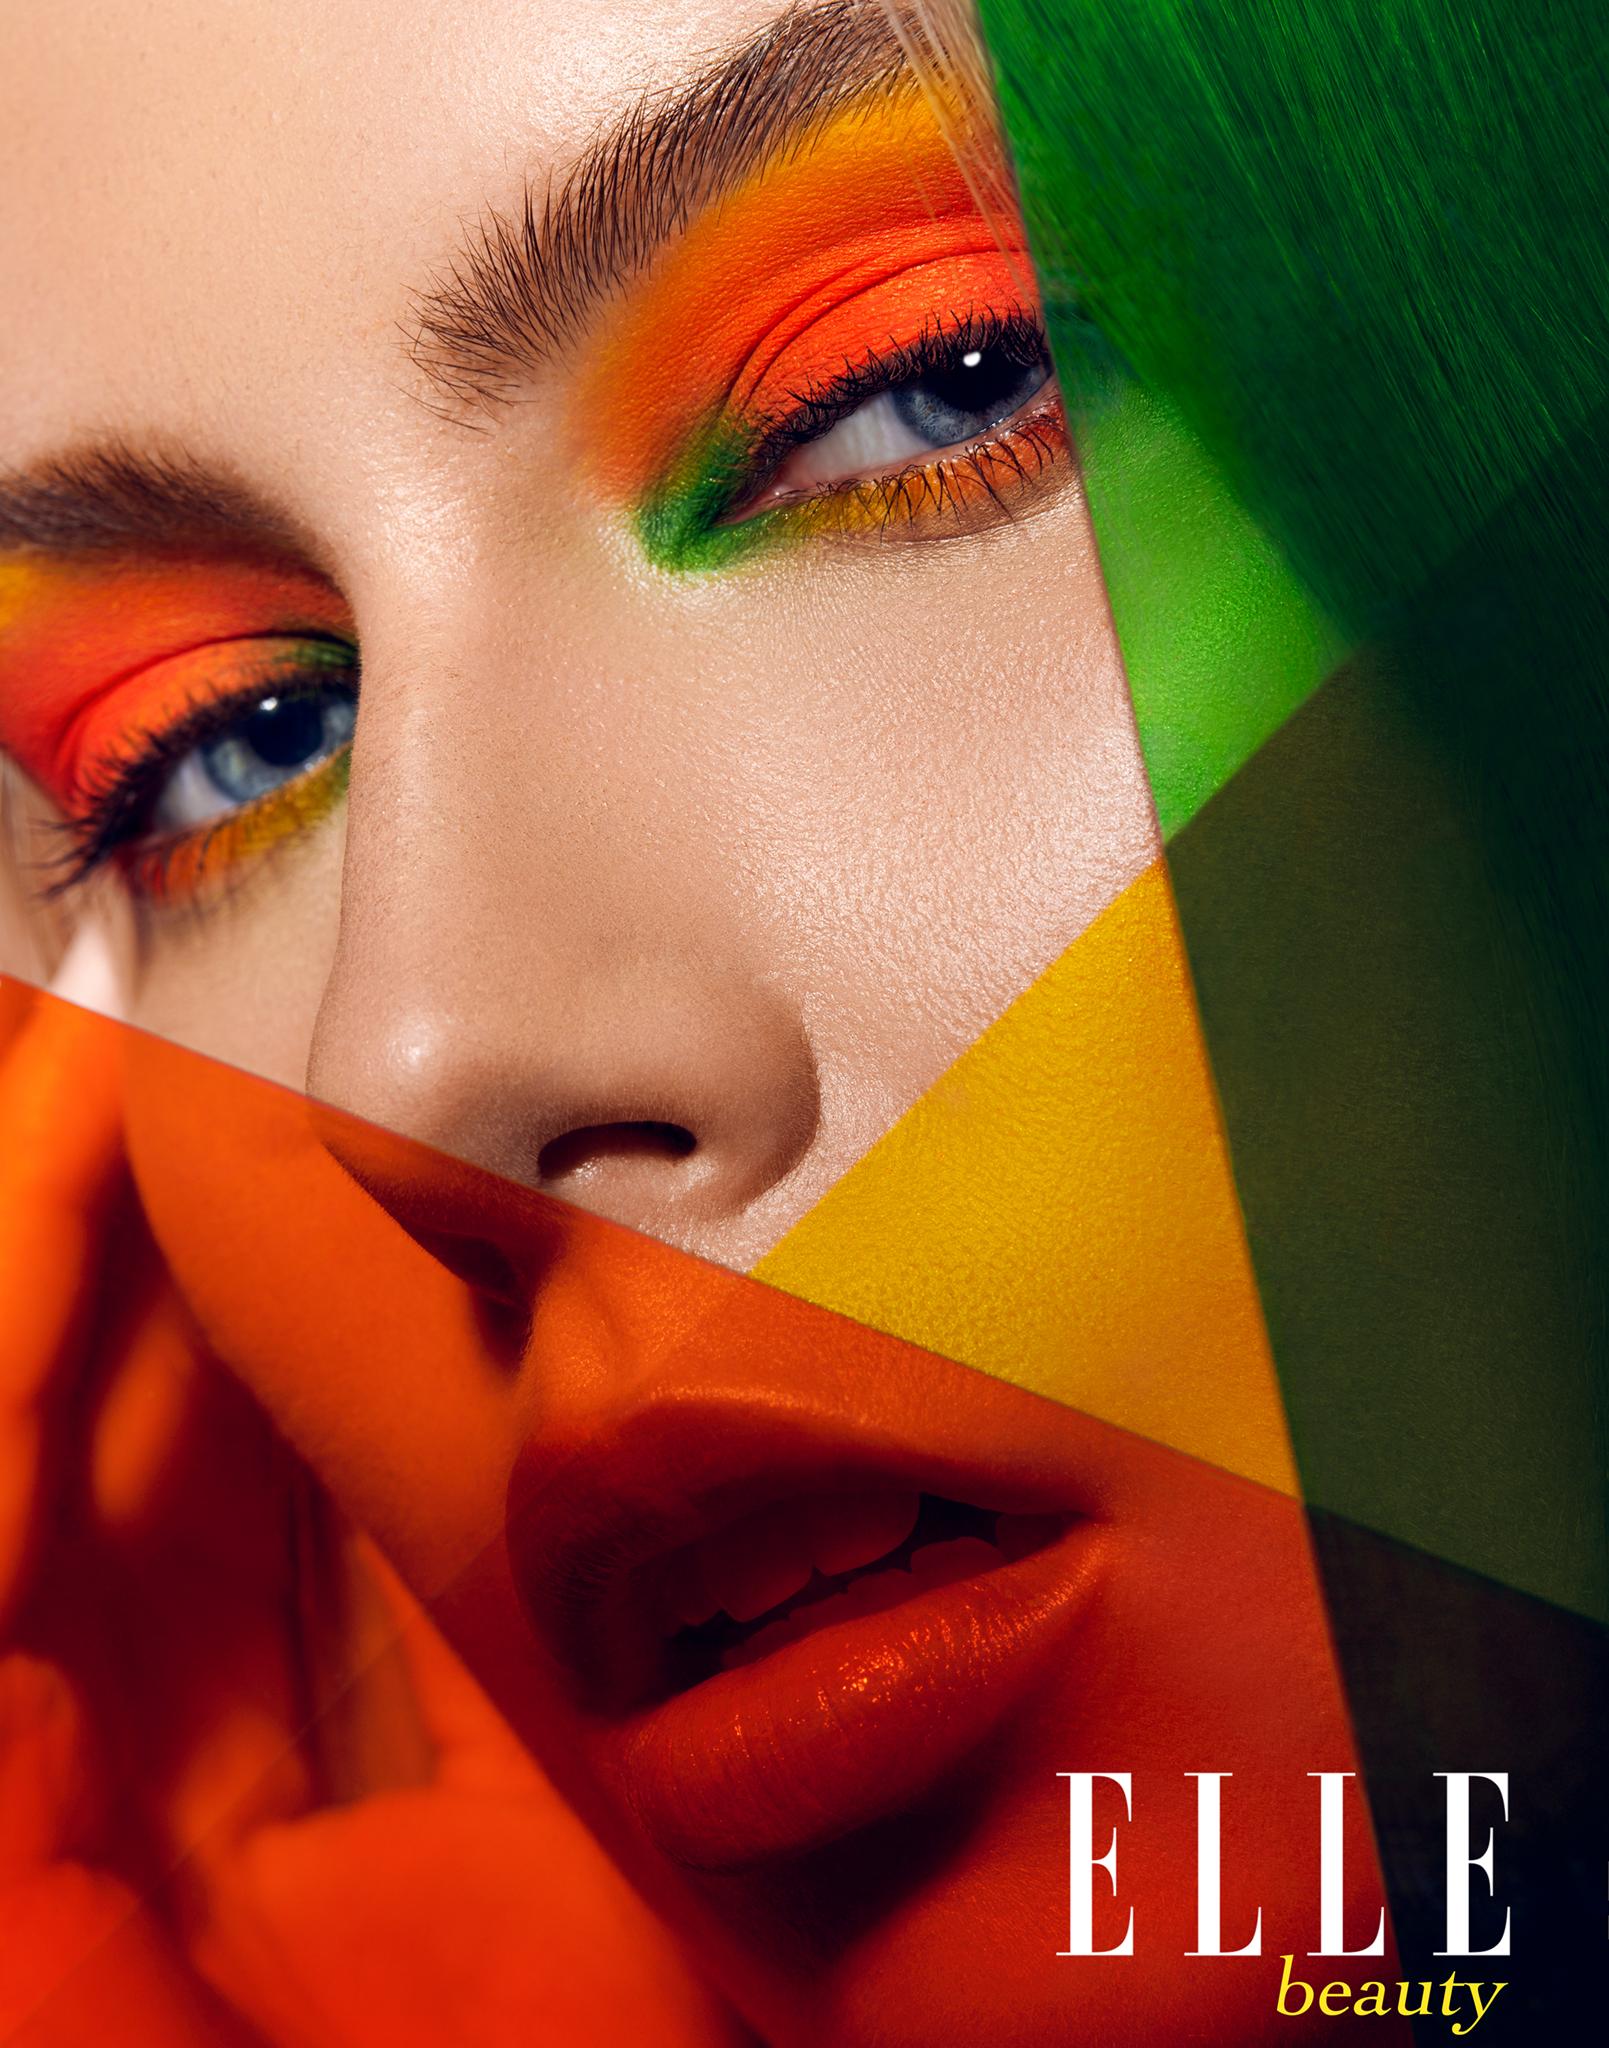 Elle Magazine, Romania's October 2018 Edition featuring OYG BIV by Antonio Martez